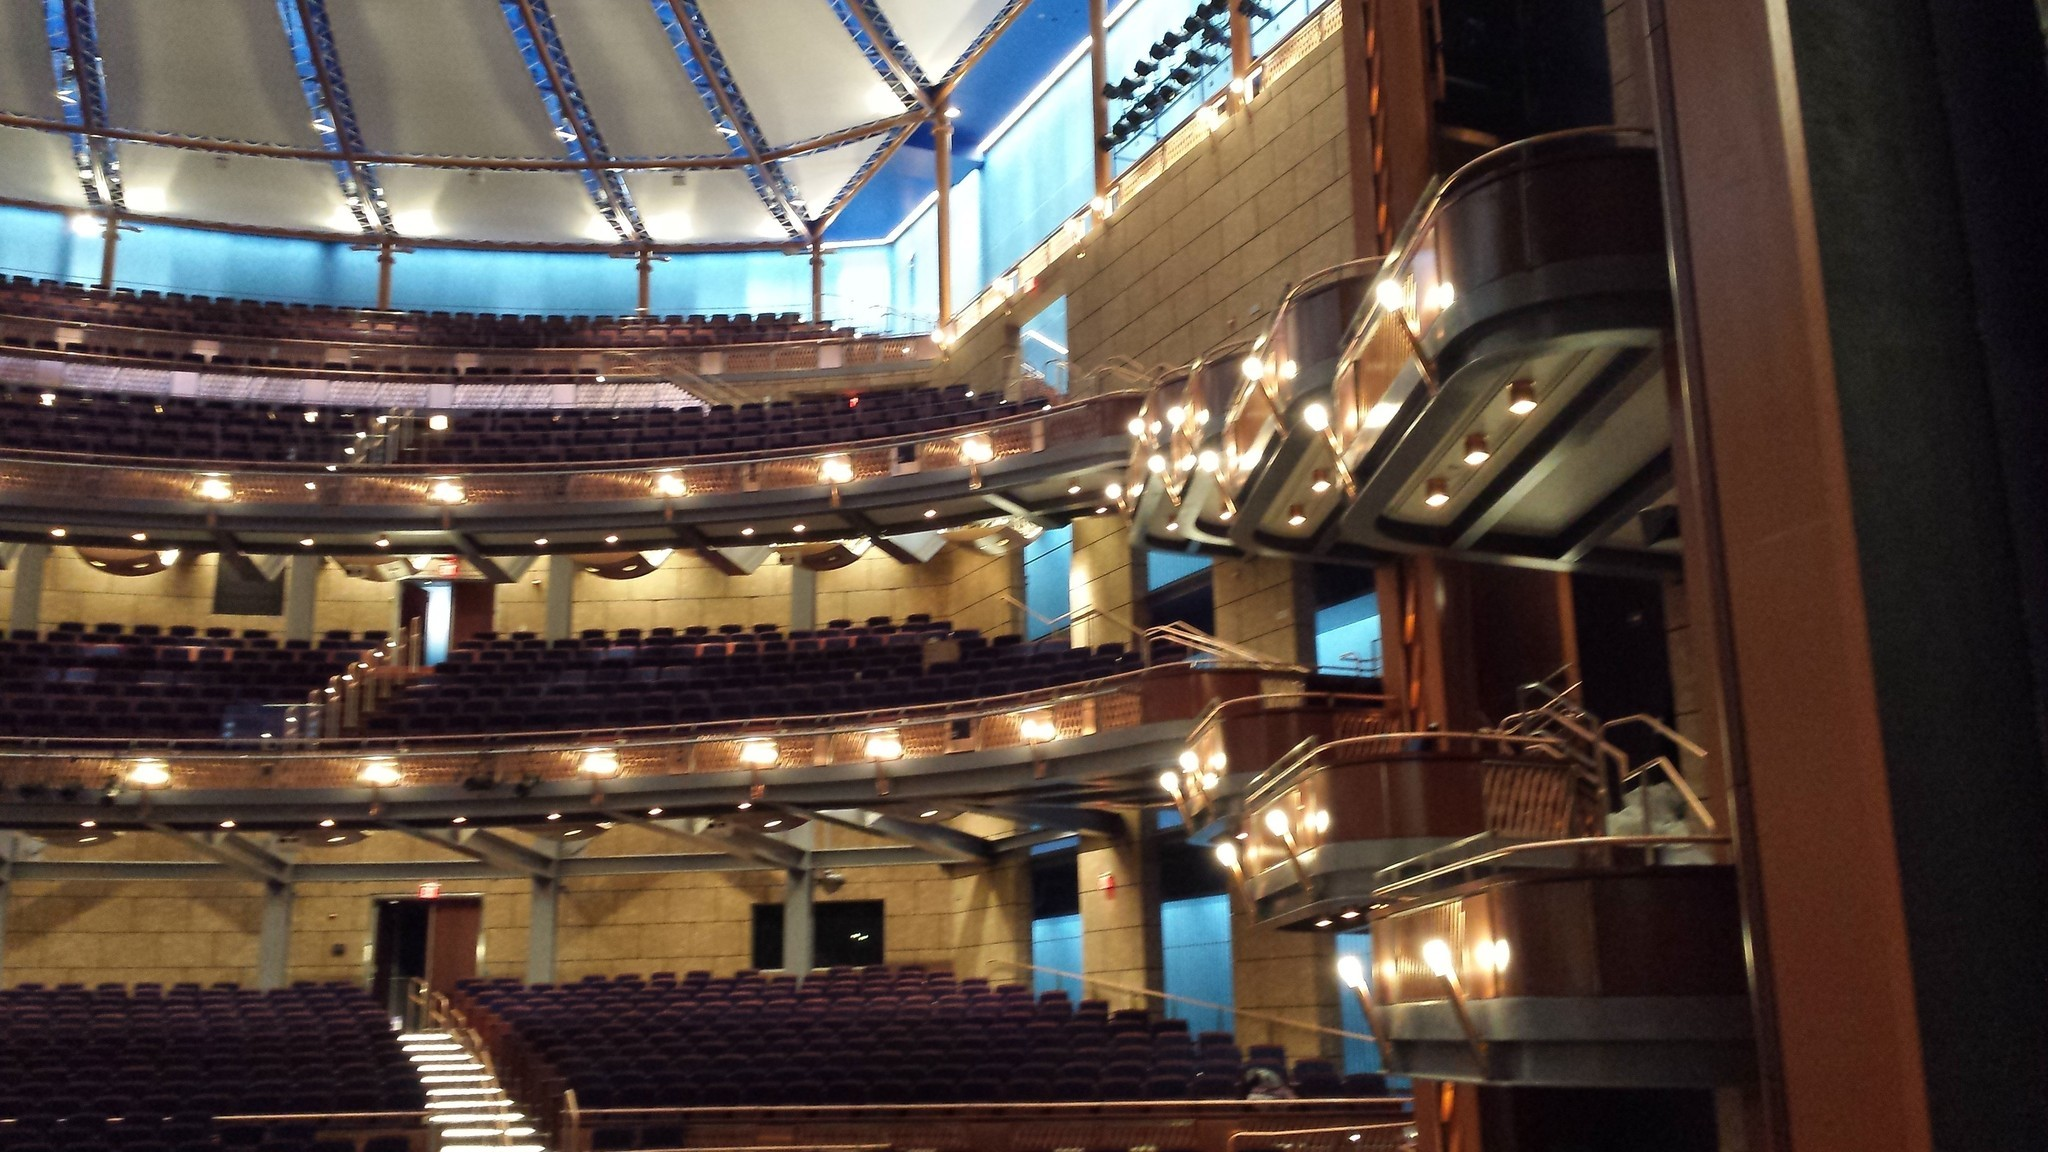 Balcony View For 1st Broadway Show In Orlando Arts Center Orlando